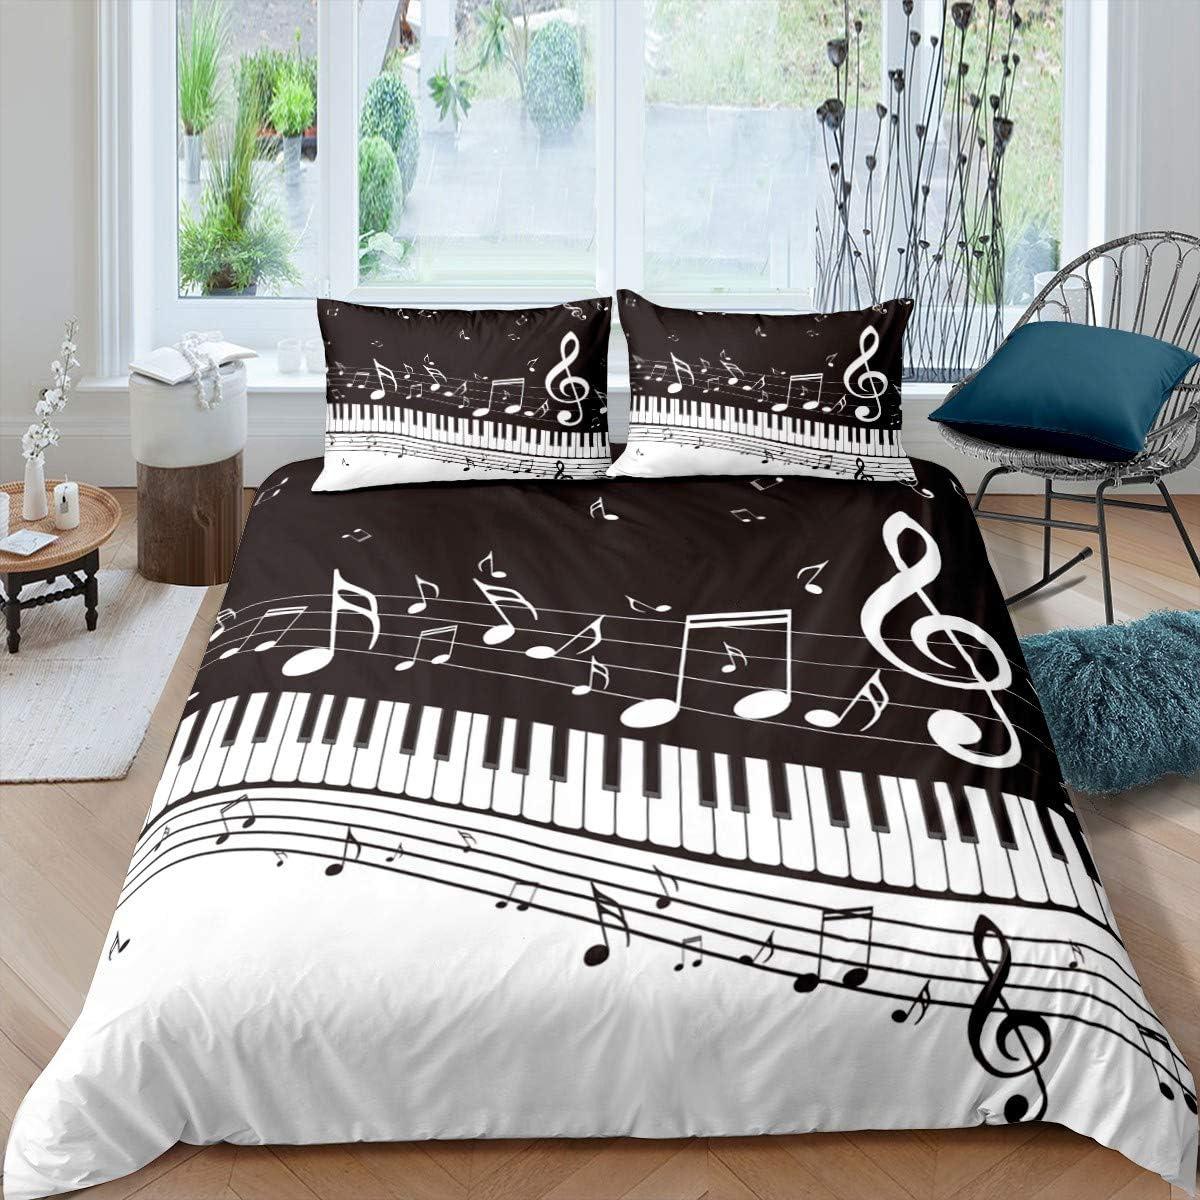 Erosebridal 2021 autumn and winter new Award Piano Comforter Cover Rotating Musical Duvet Notes C